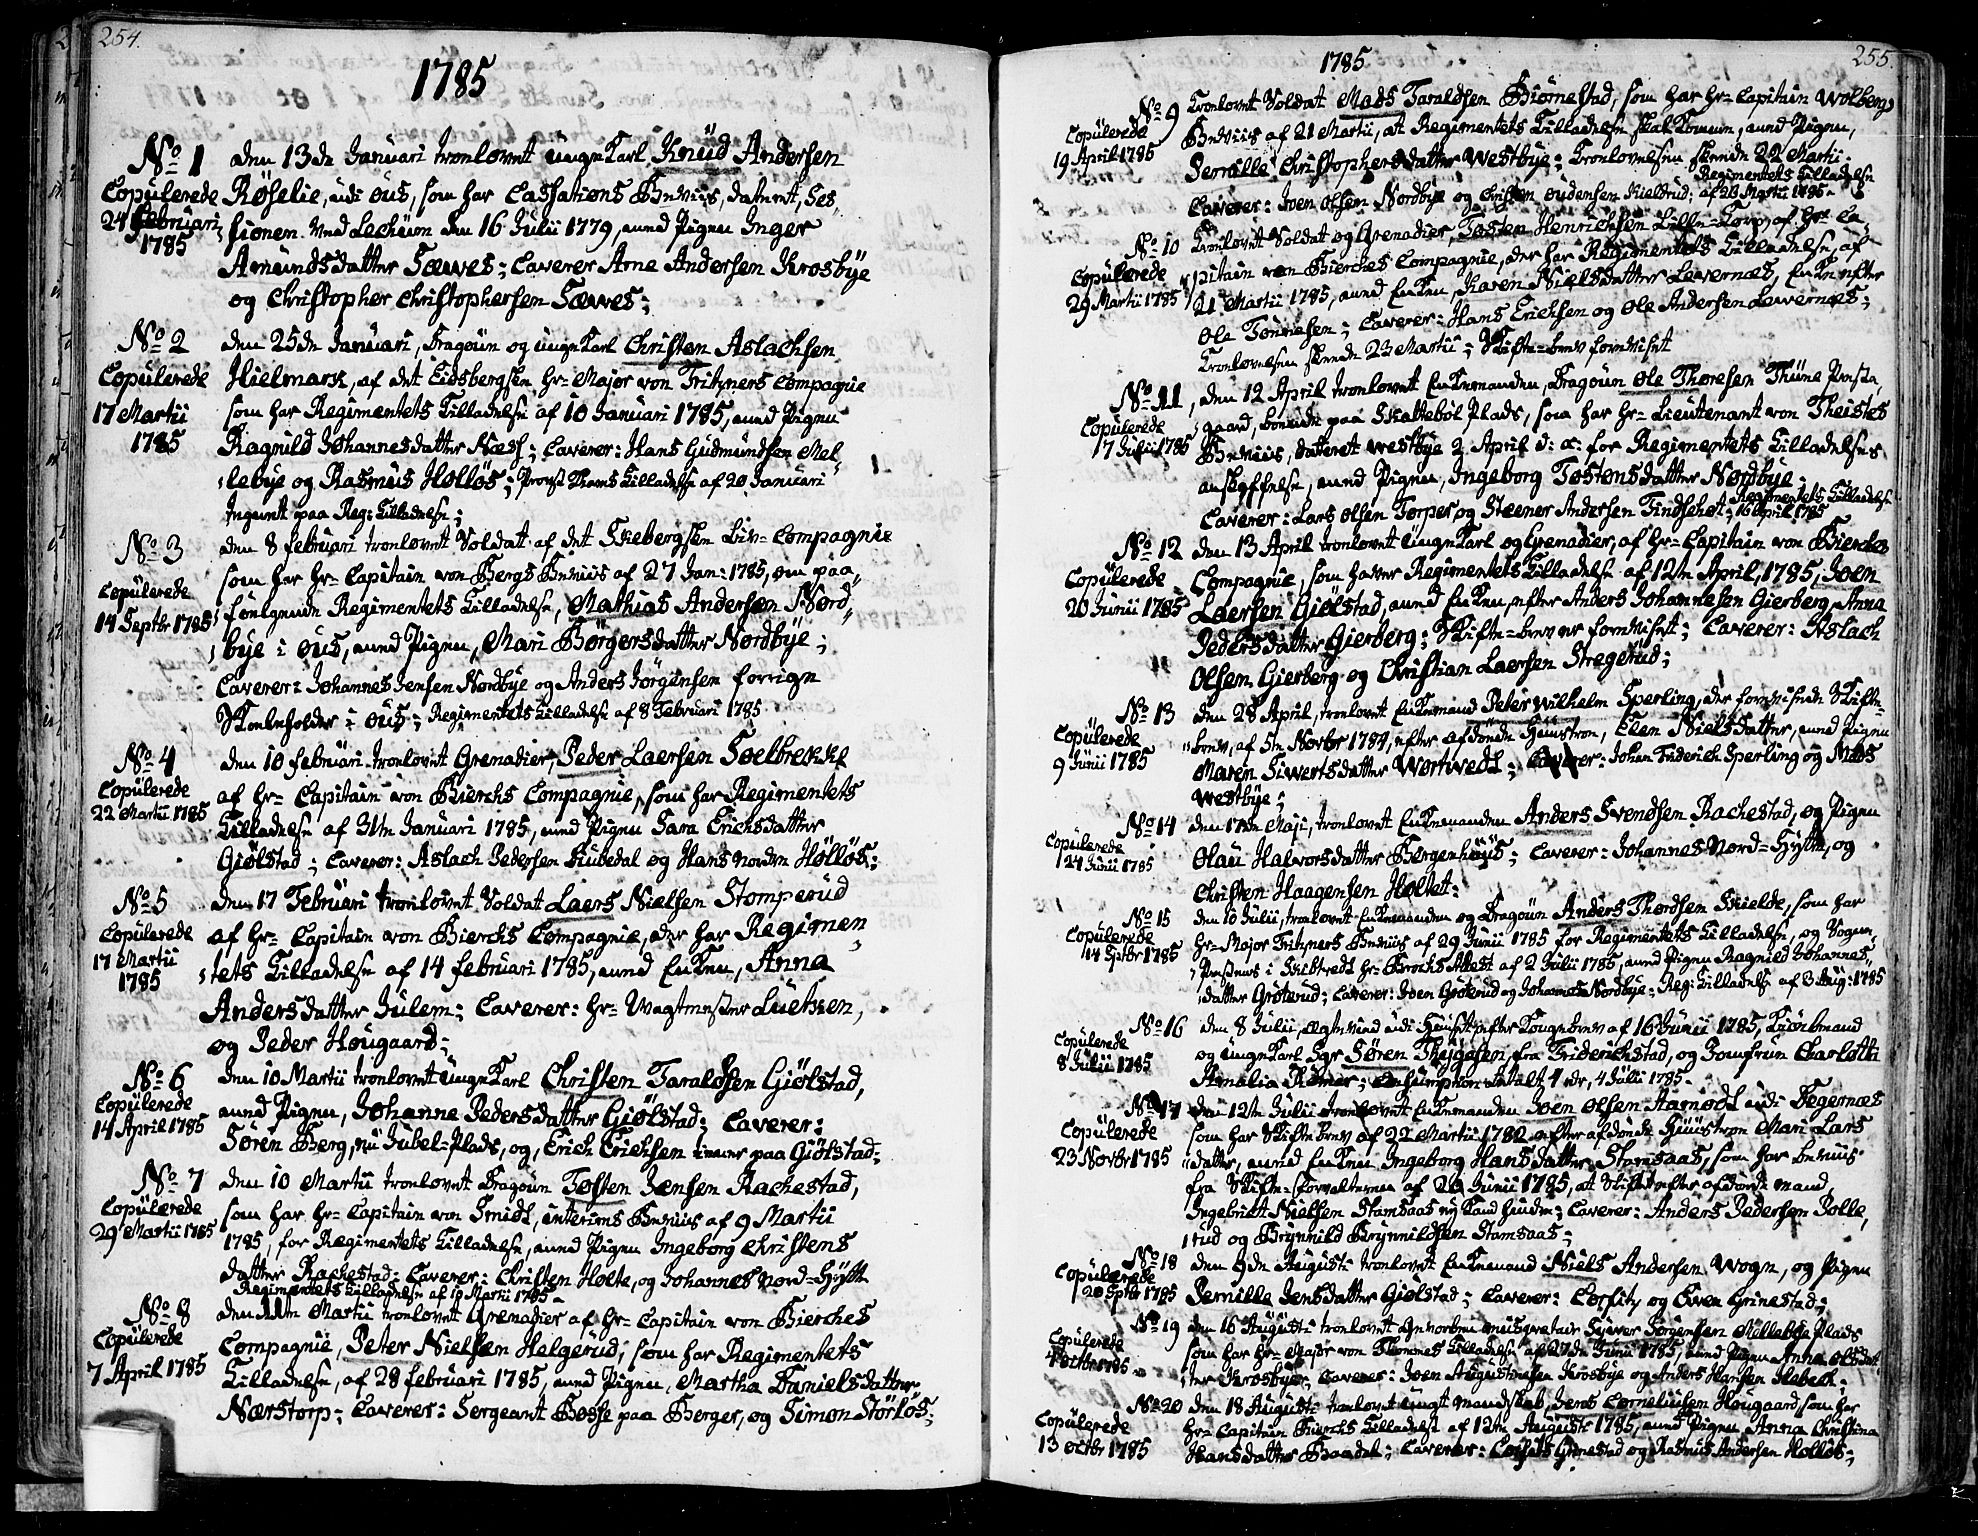 SAO, Rakkestad prestekontor Kirkebøker, F/Fa/L0005: Ministerialbok nr. I 5, 1784-1814, s. 254-255